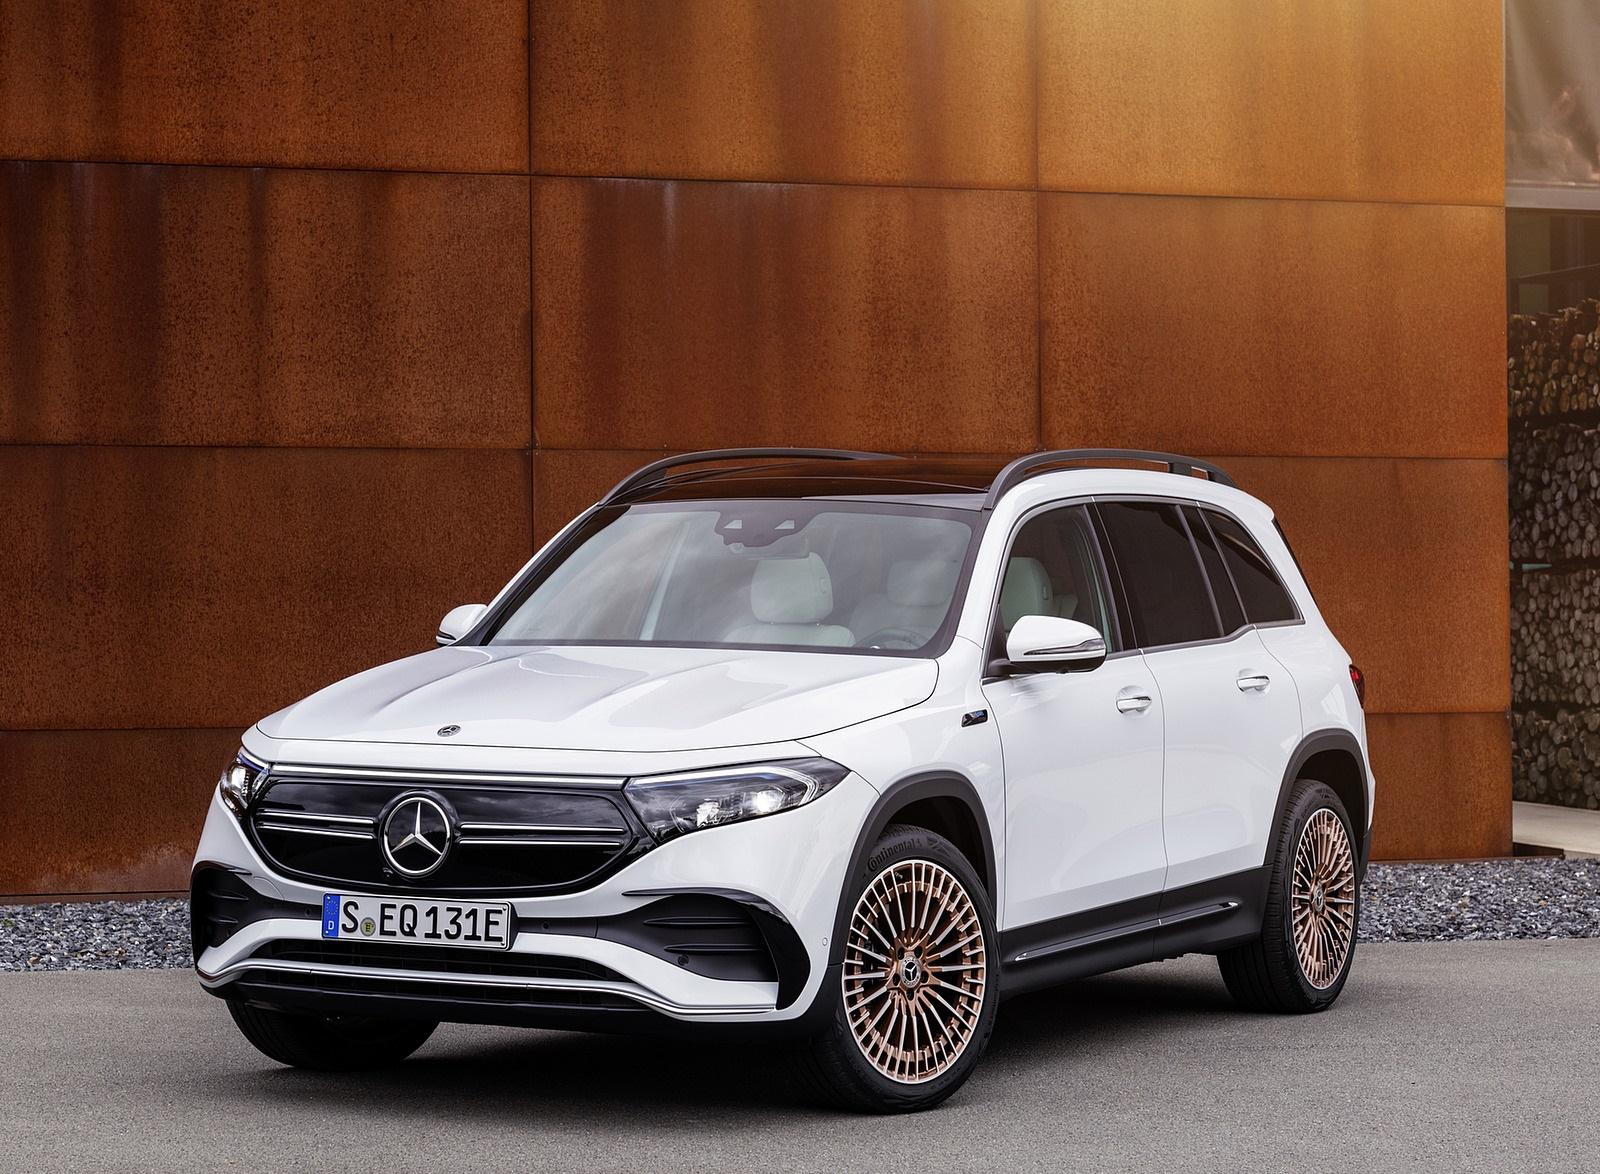 2022 Mercedes-Benz EQB Edition 1 (Color: Digital White) Front Three-Quarter Wallpapers (9)